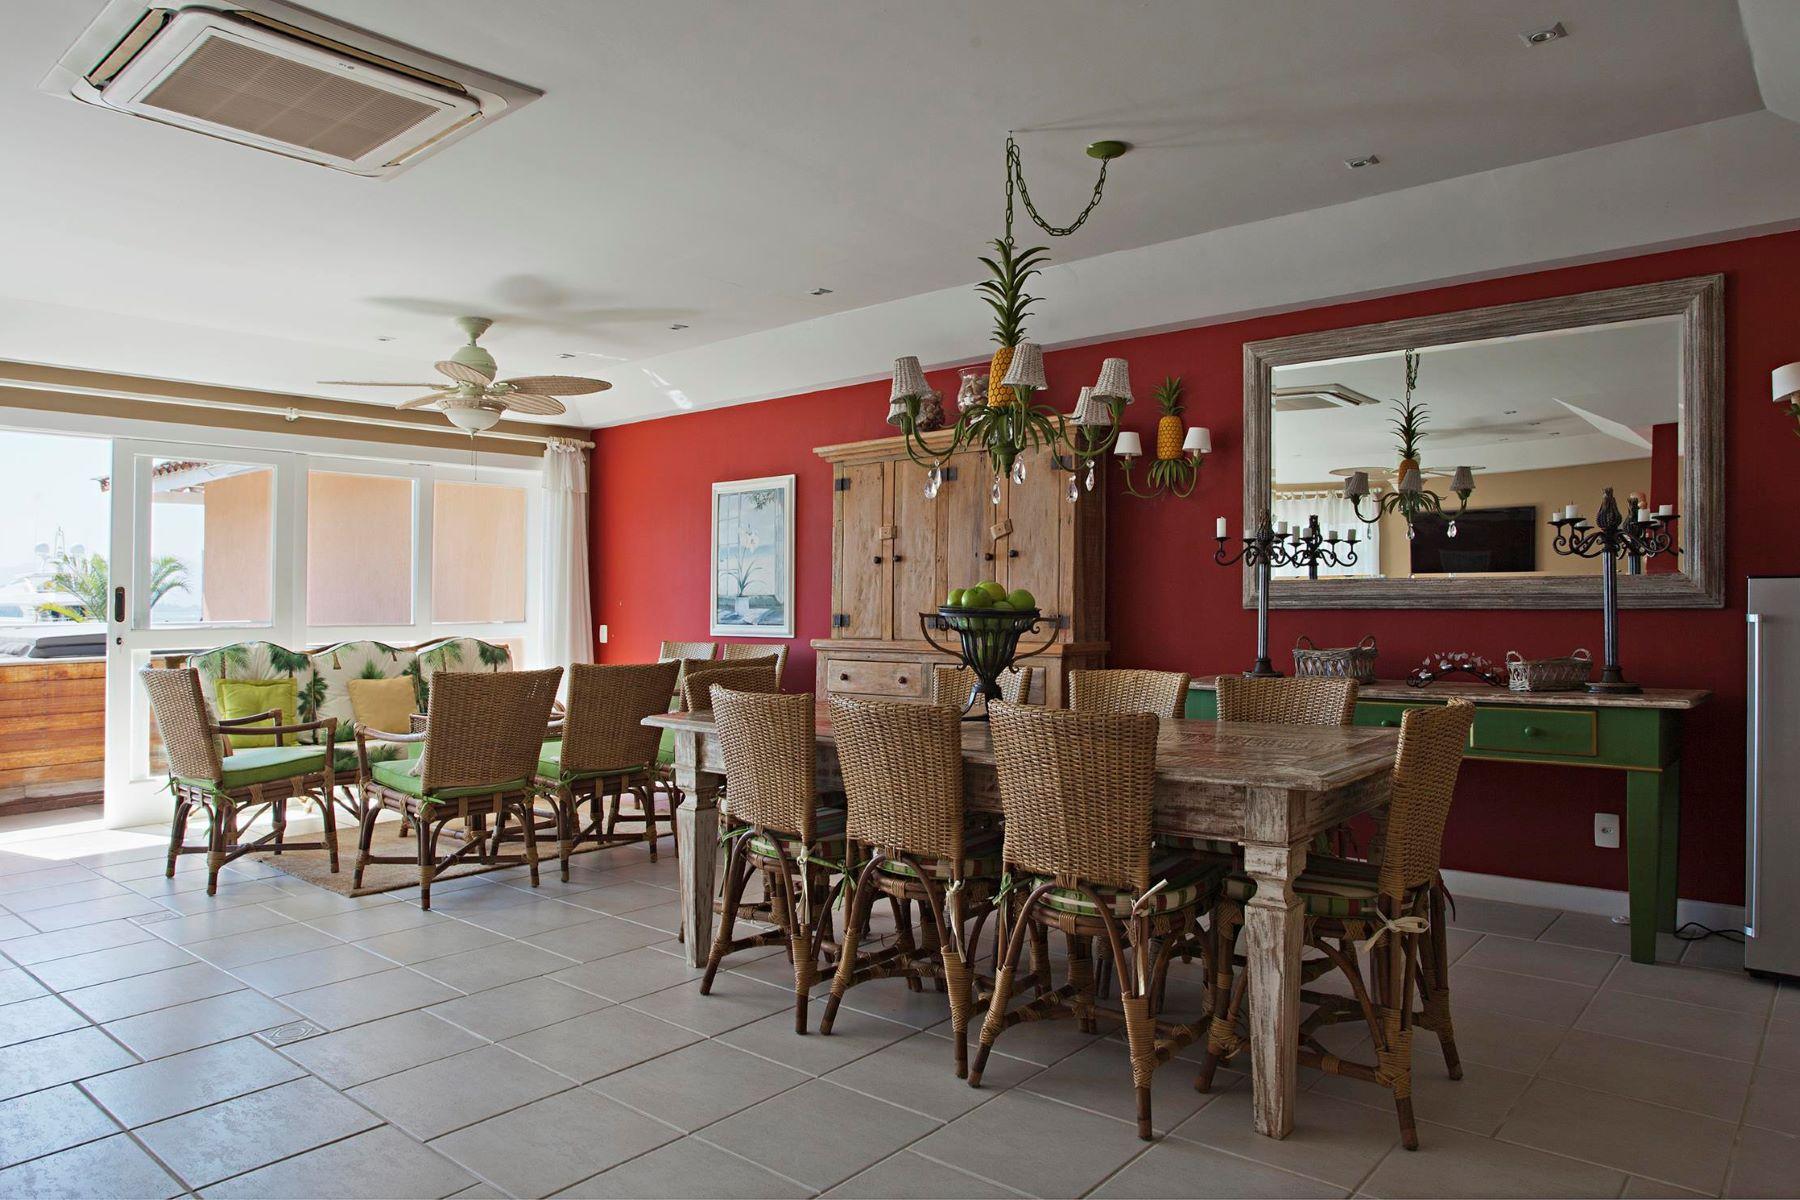 Einfamilienhaus für Verkauf beim Penthouse on the Beach Rodovia BR 101 Angra Dos Reis, Rio De Janeiro, 23903-000 Brasilien